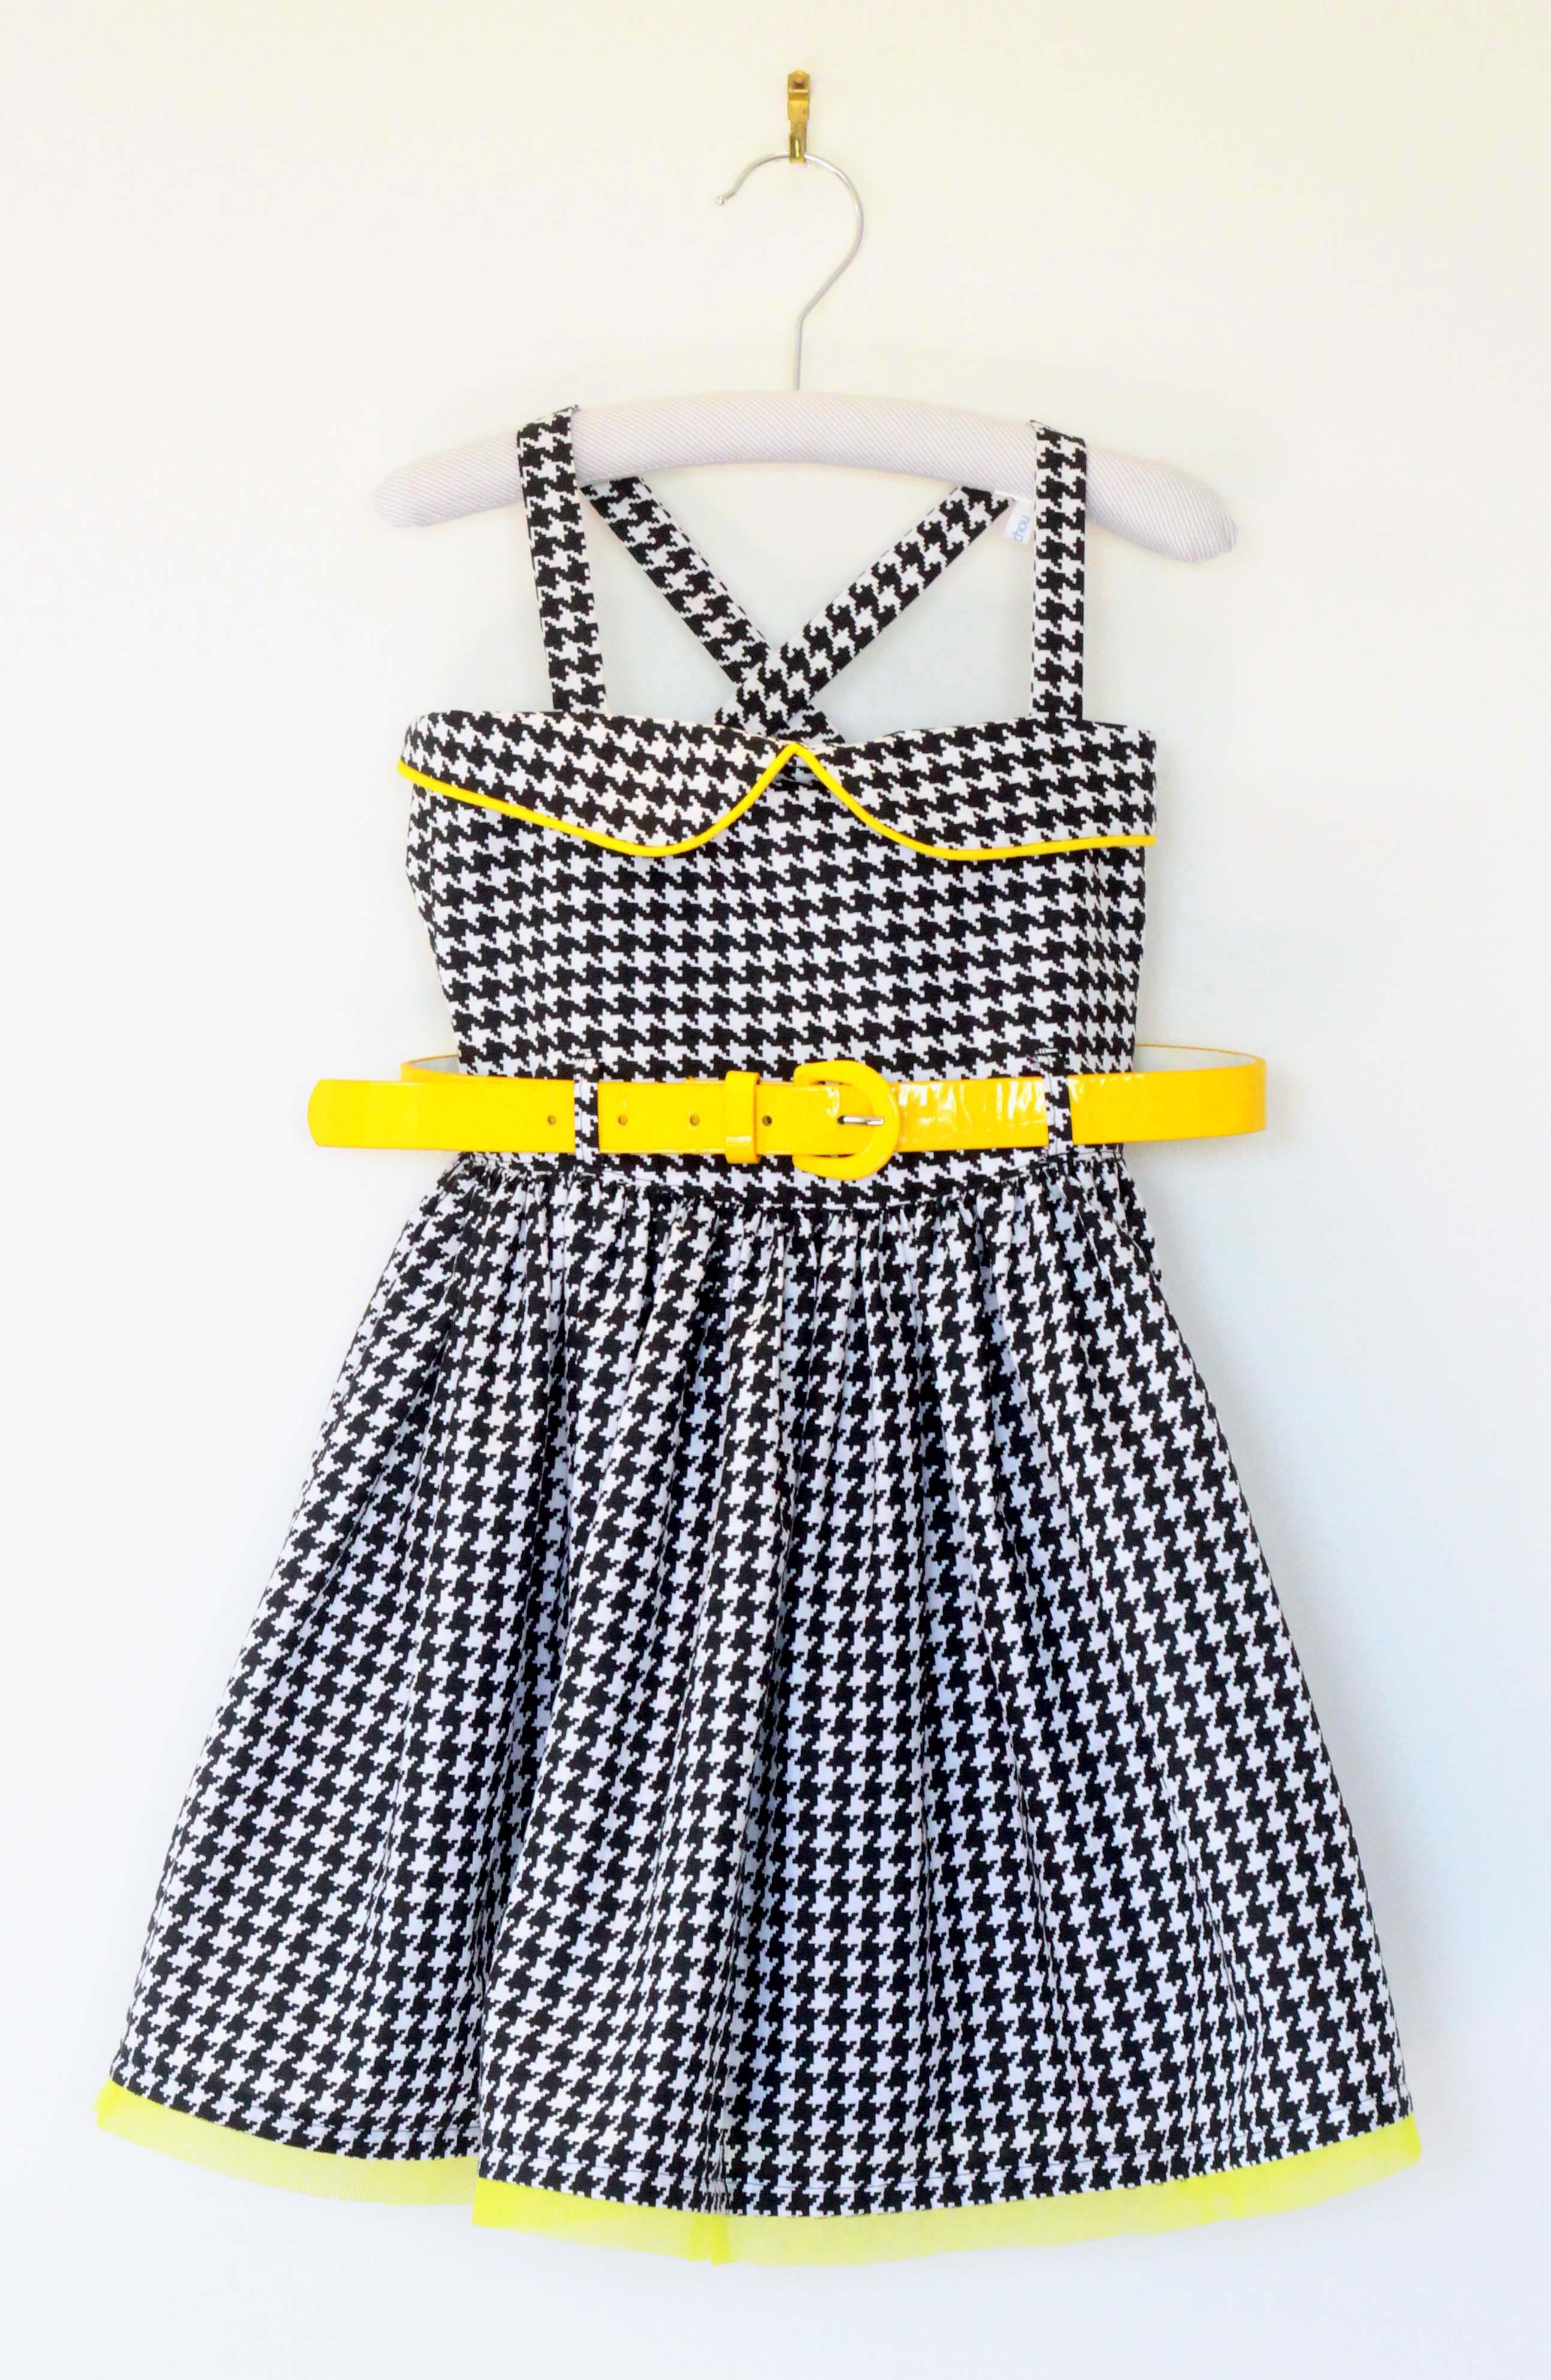 robe tissu pied de poule, passepoil et tulle jaune